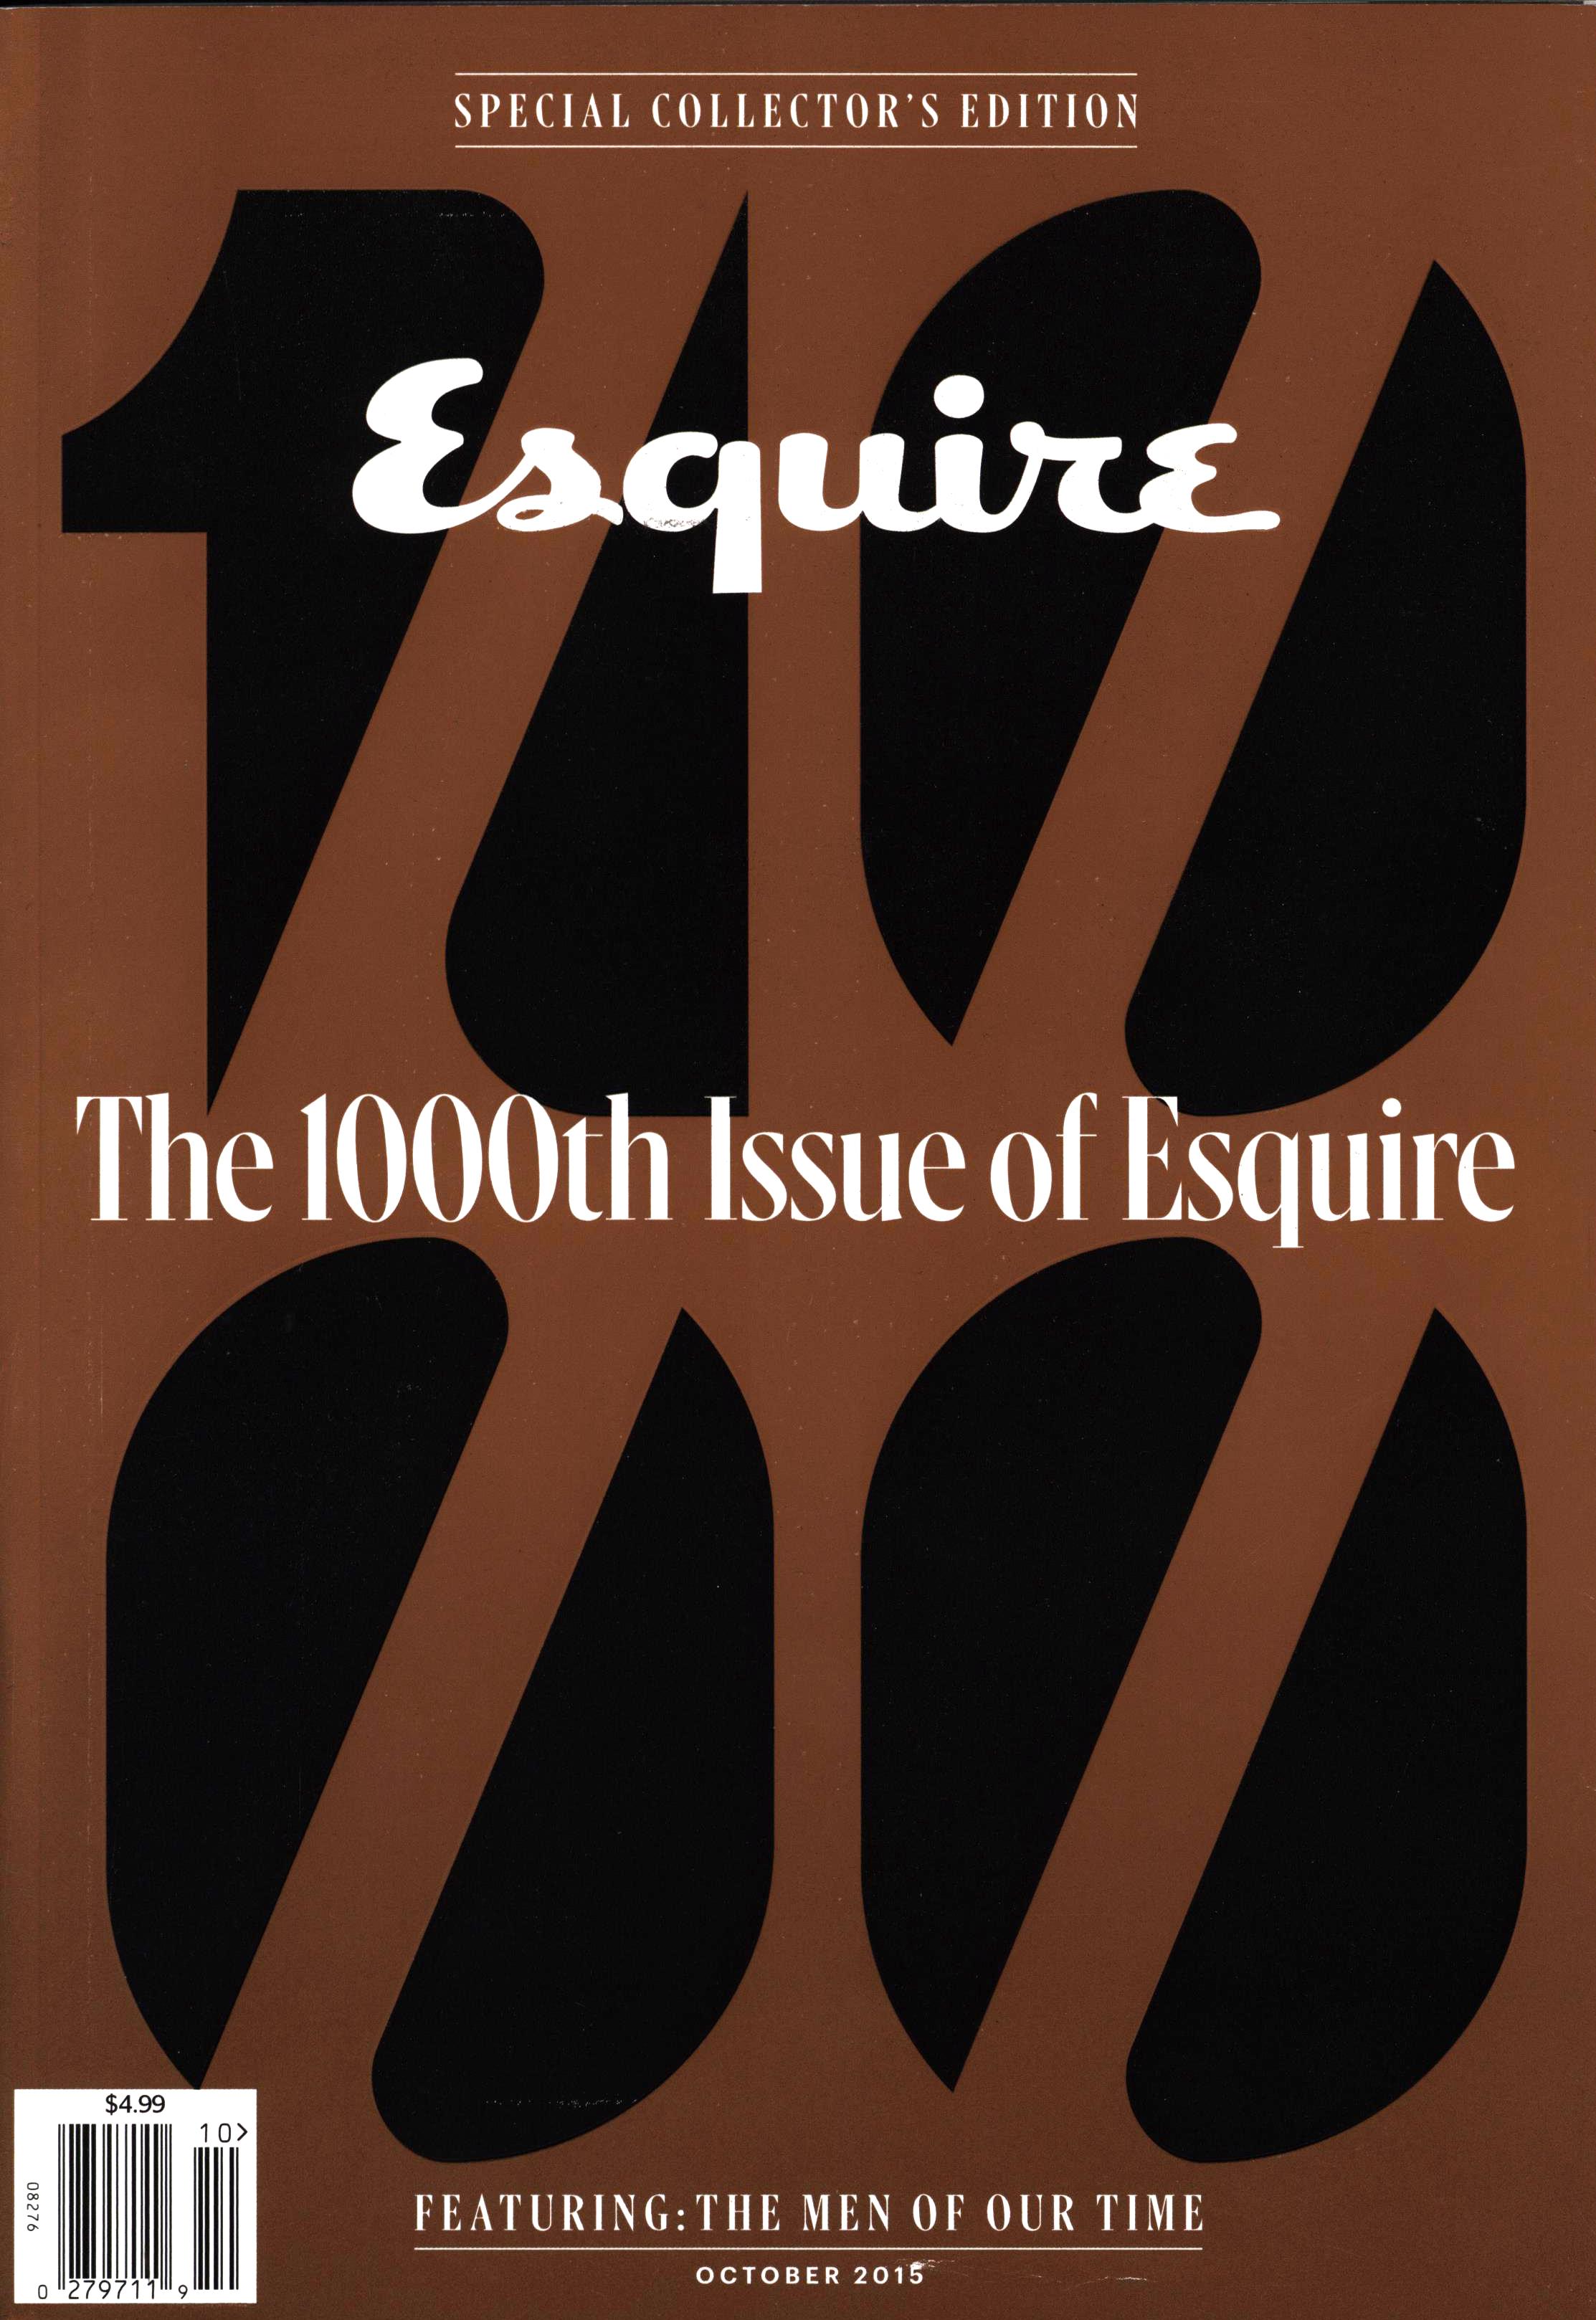 Lili Anolik_Esquire Magazine_F. Scott Fitzgerald_October 2015